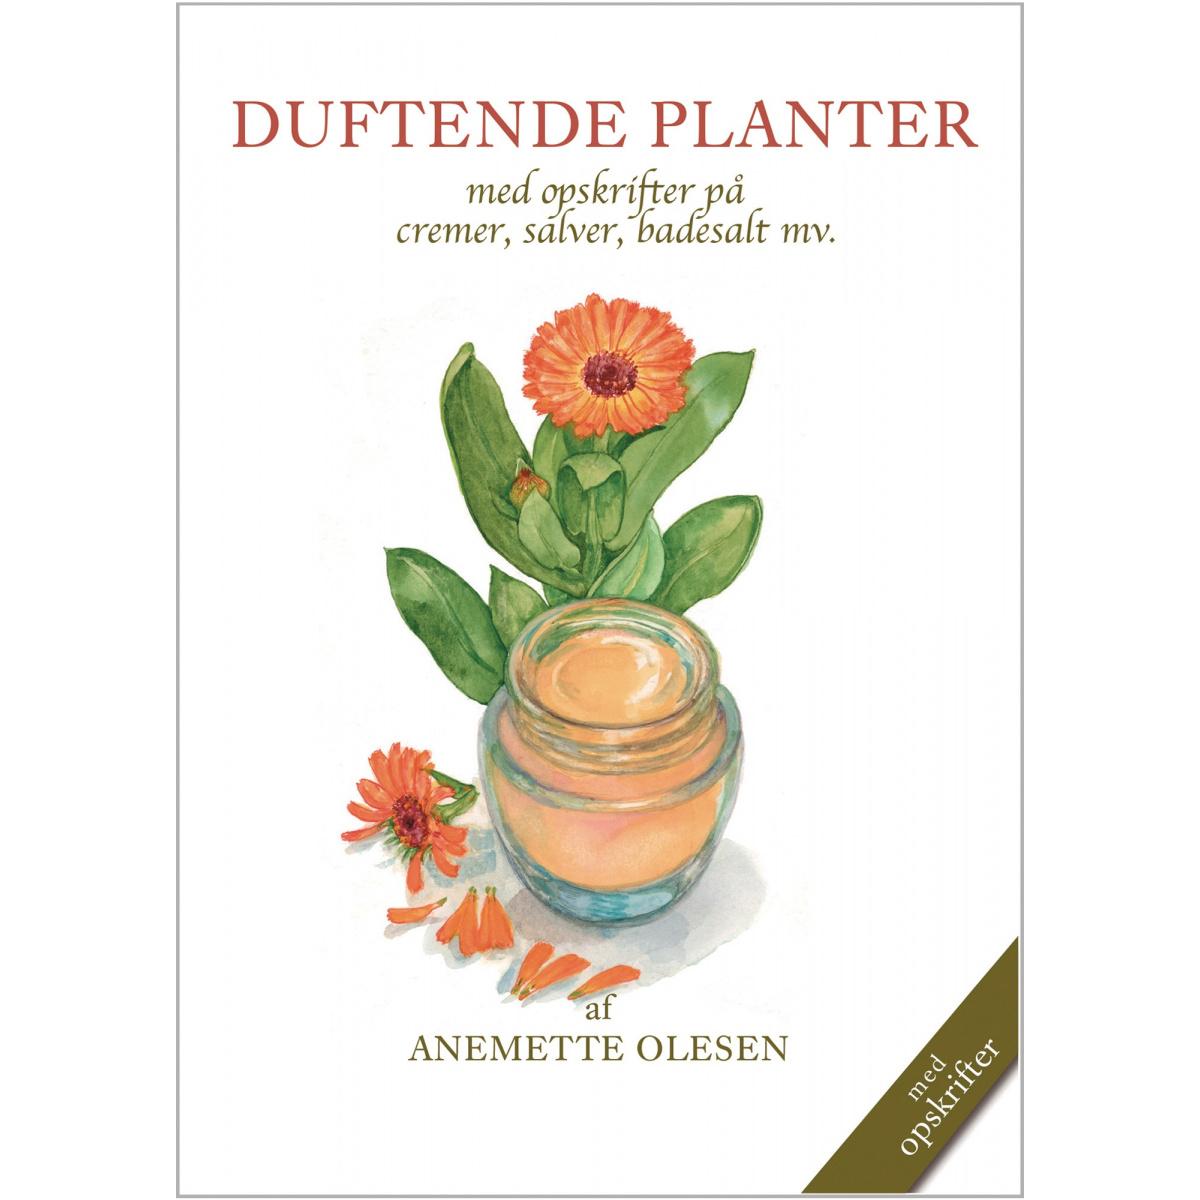 Duftende planter